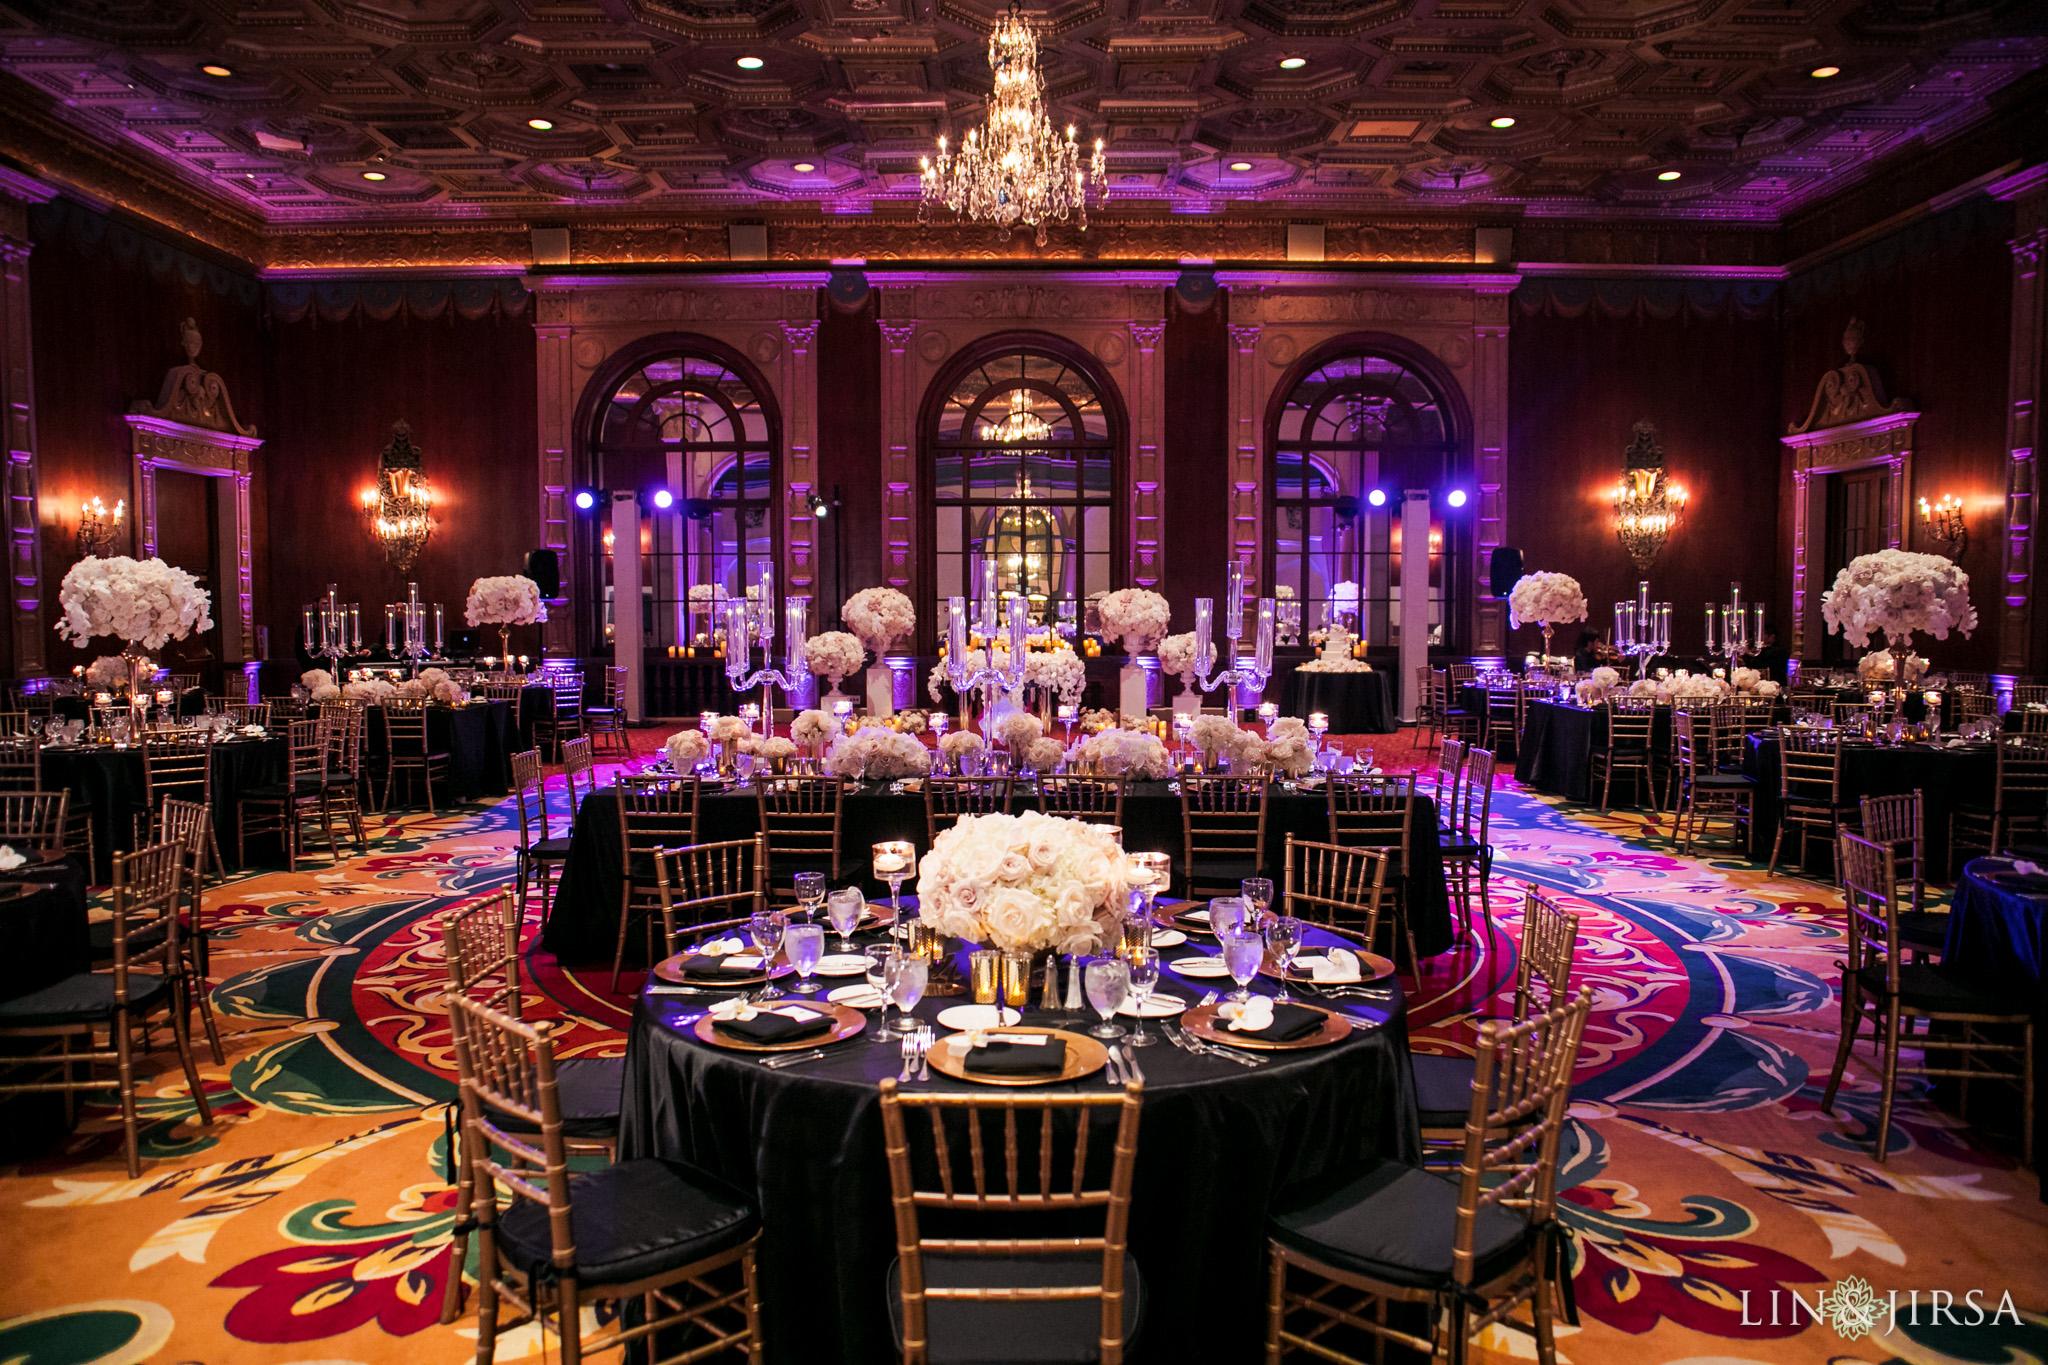 018 millennium biltmore hotel los angeles wedding photography